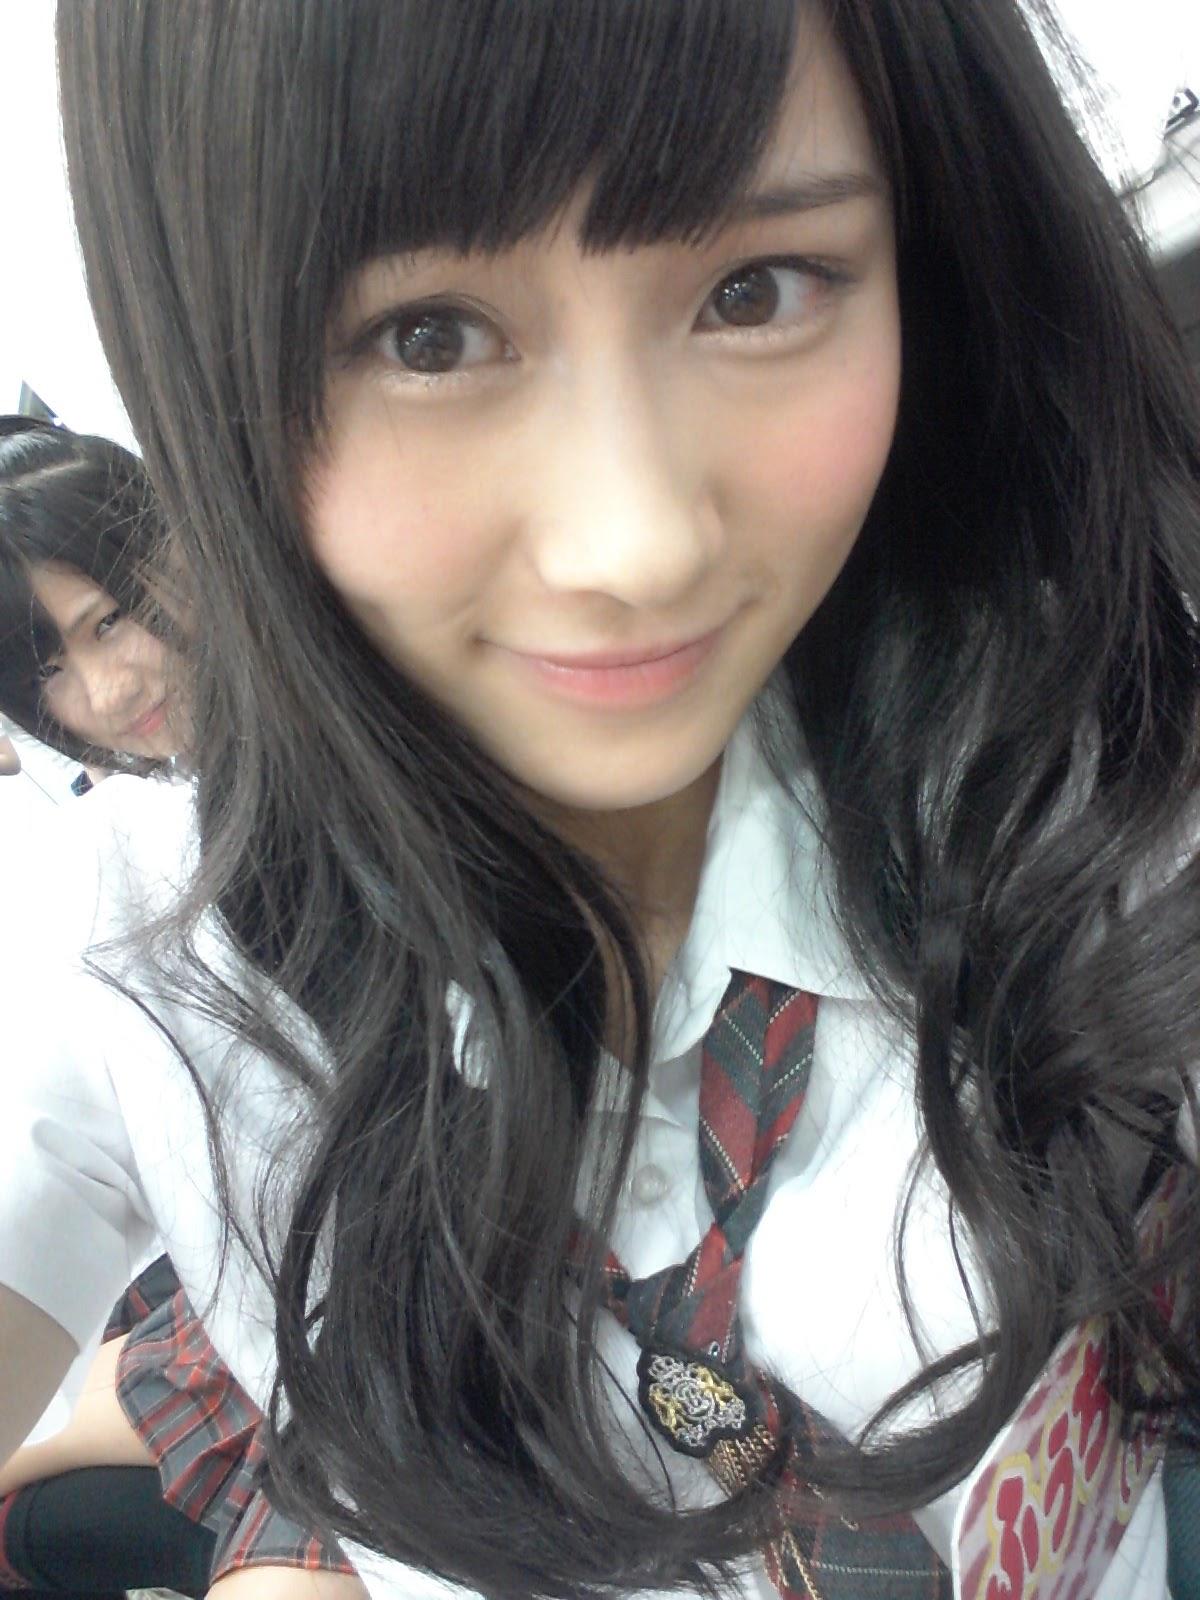 NAVER まとめNMB48『イビサガール』選抜メンバー画像・プロフィール